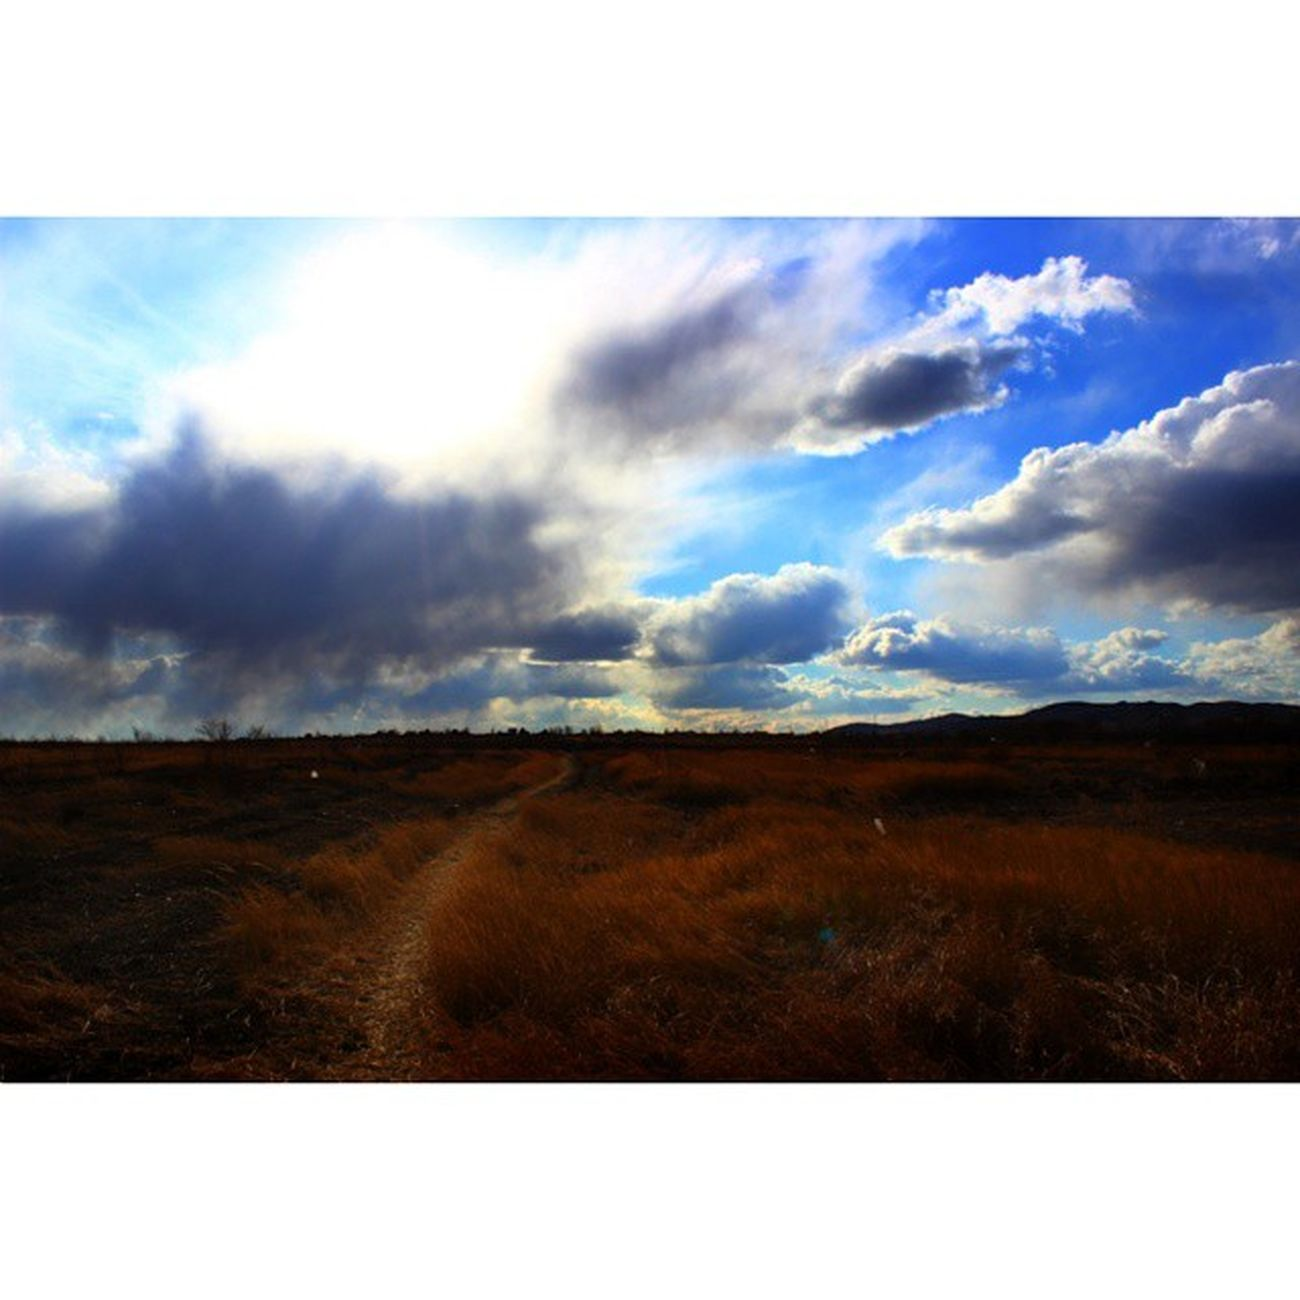 краснокаменск степьдастепькругом какоенебовзабайкалье Sky небо любимыйгород